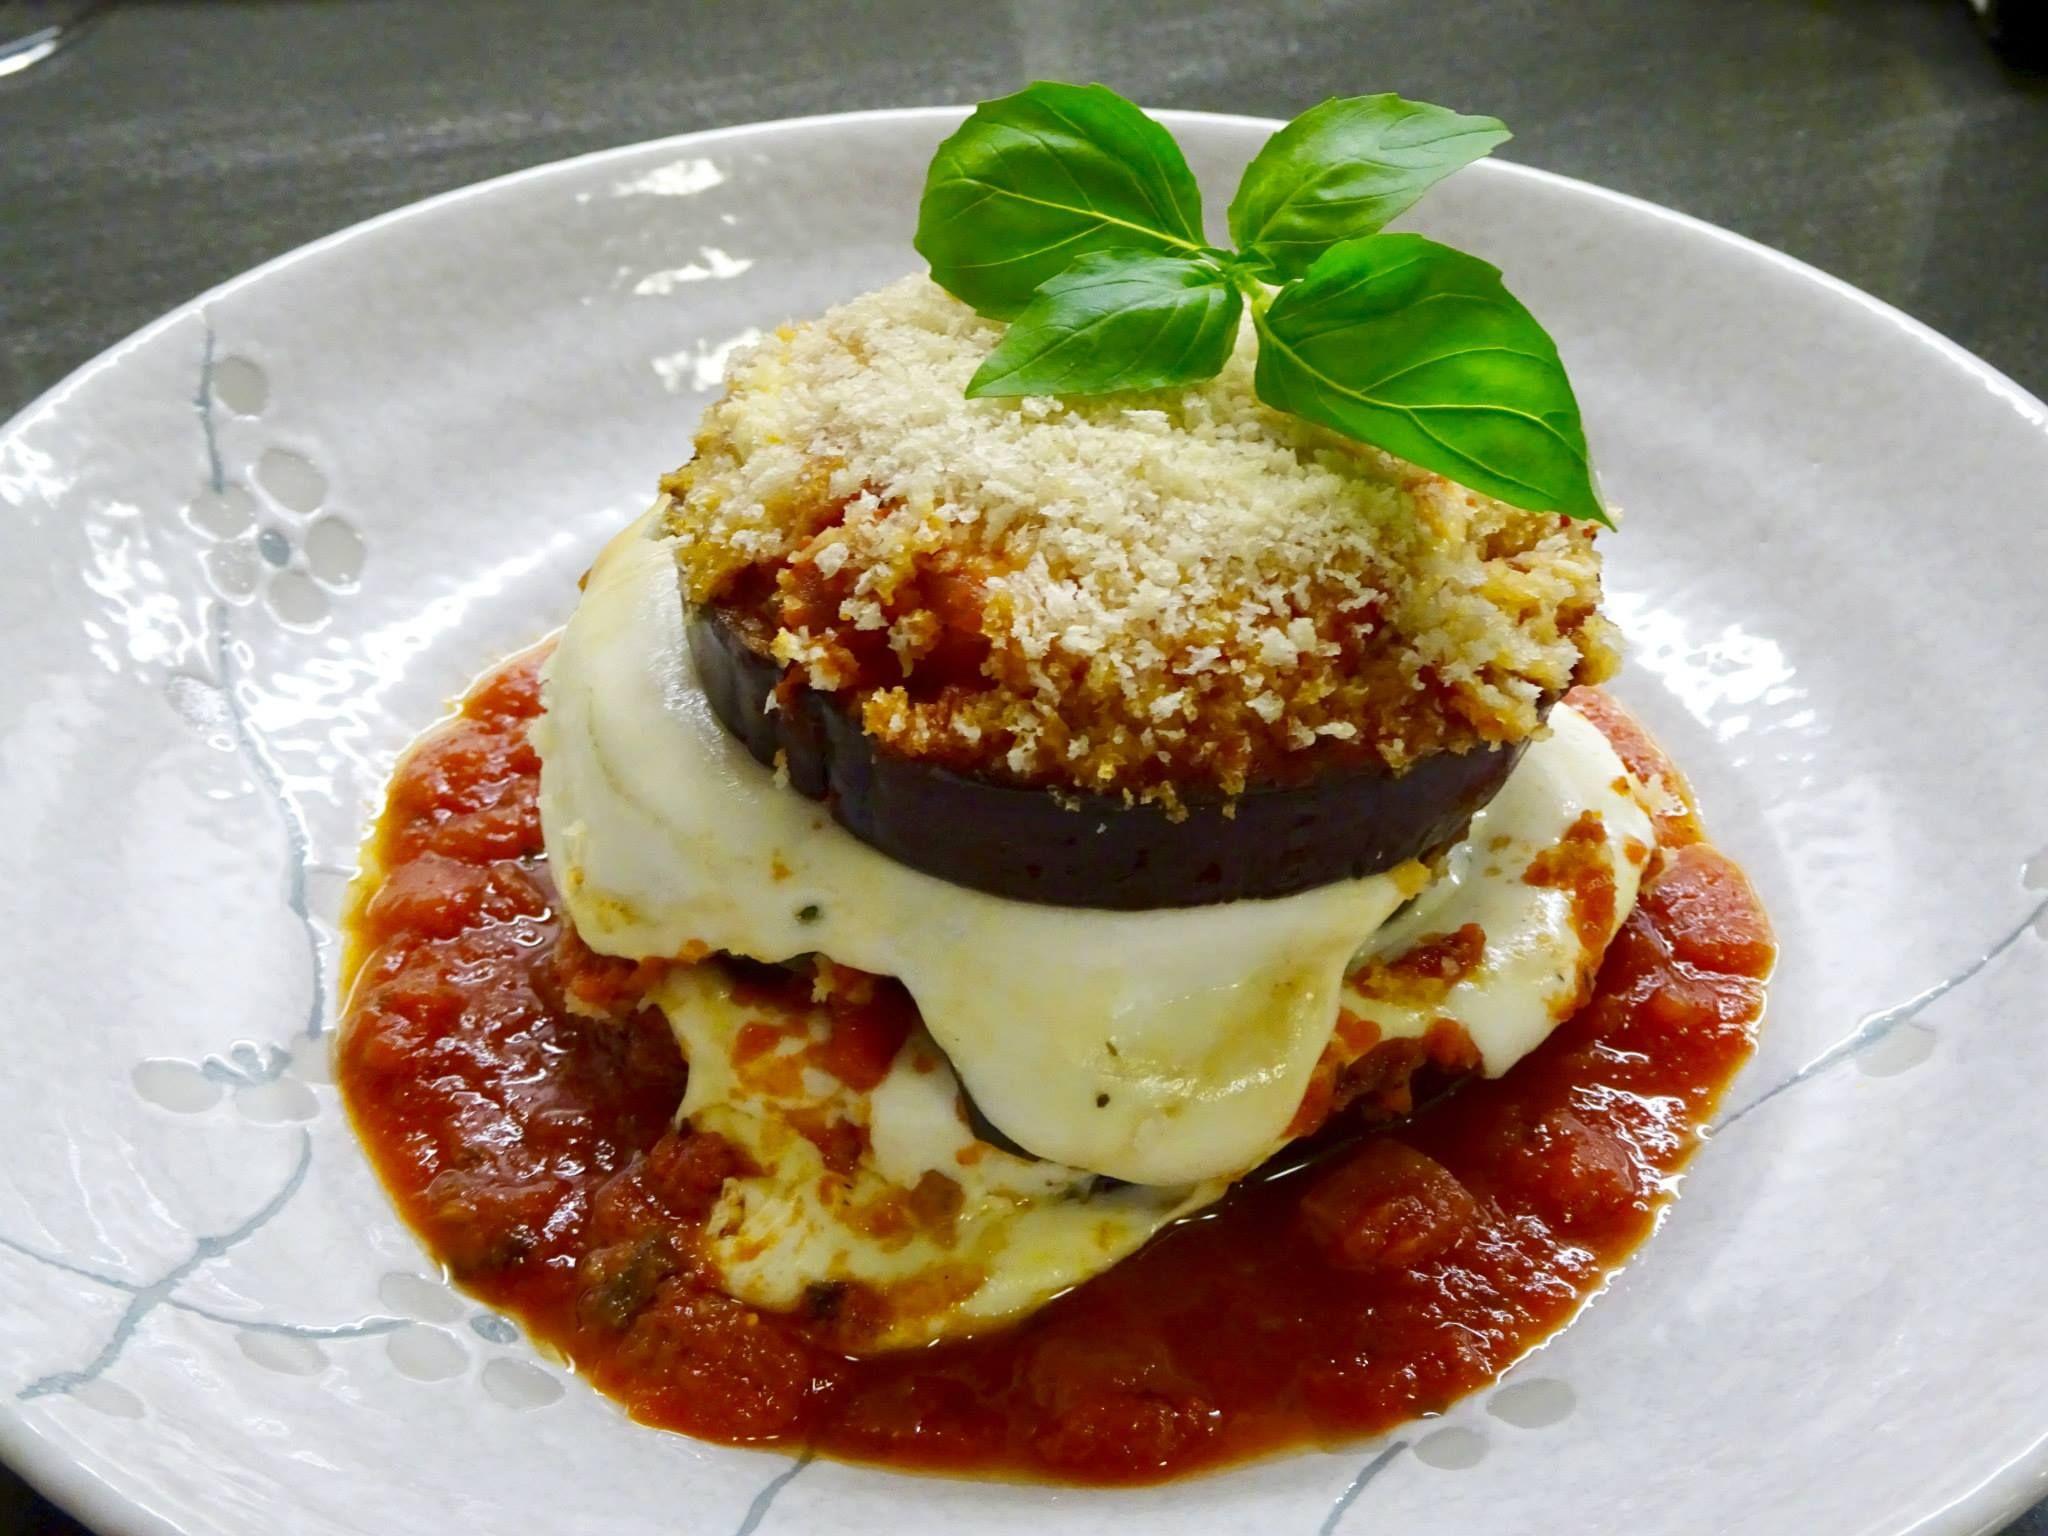 Eggplant Parm with smoked mozzarella, fresh basil, San Marzano tomato sauce and panko bread crumbs...... Never go light on the mozzarella.....